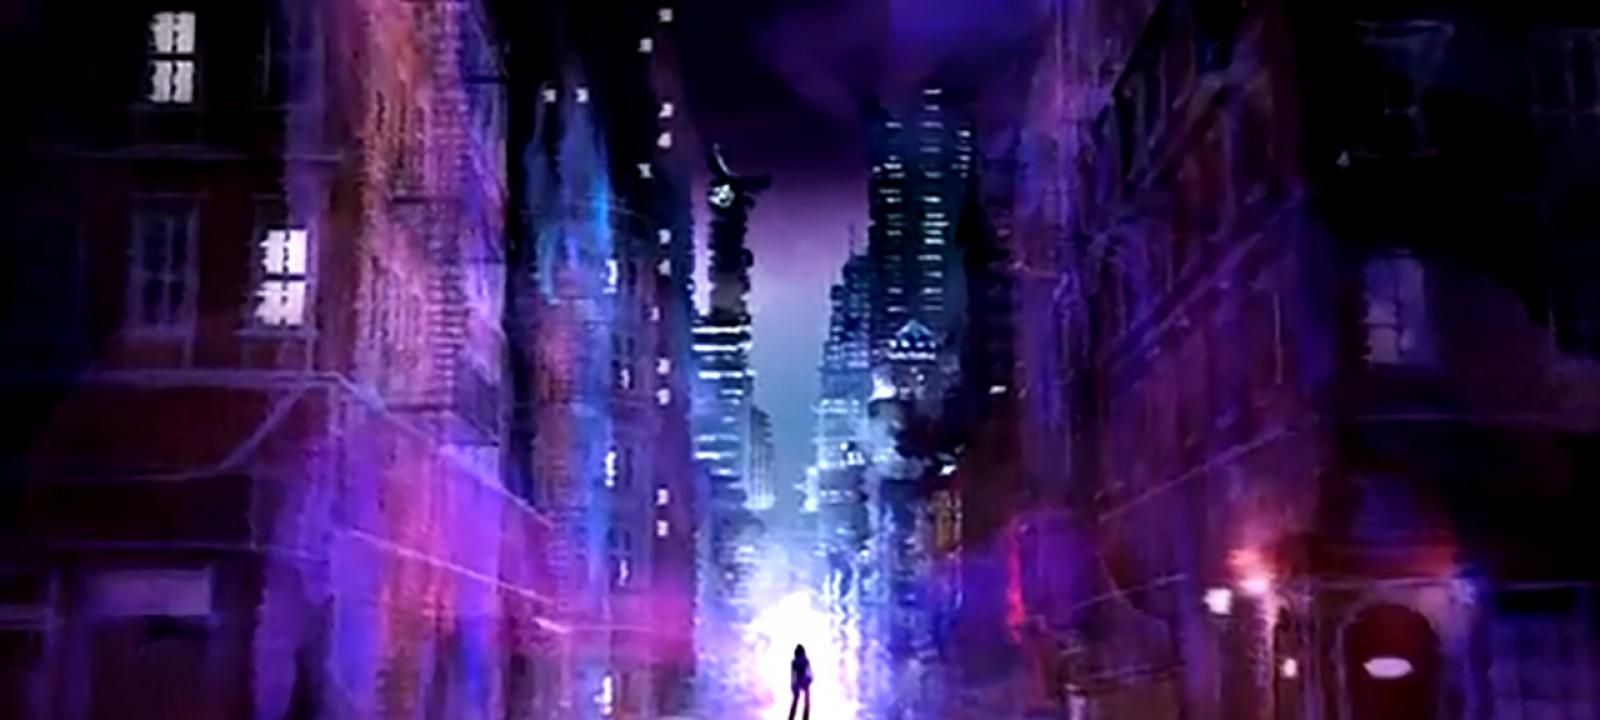 PurpleImageJessicaJones